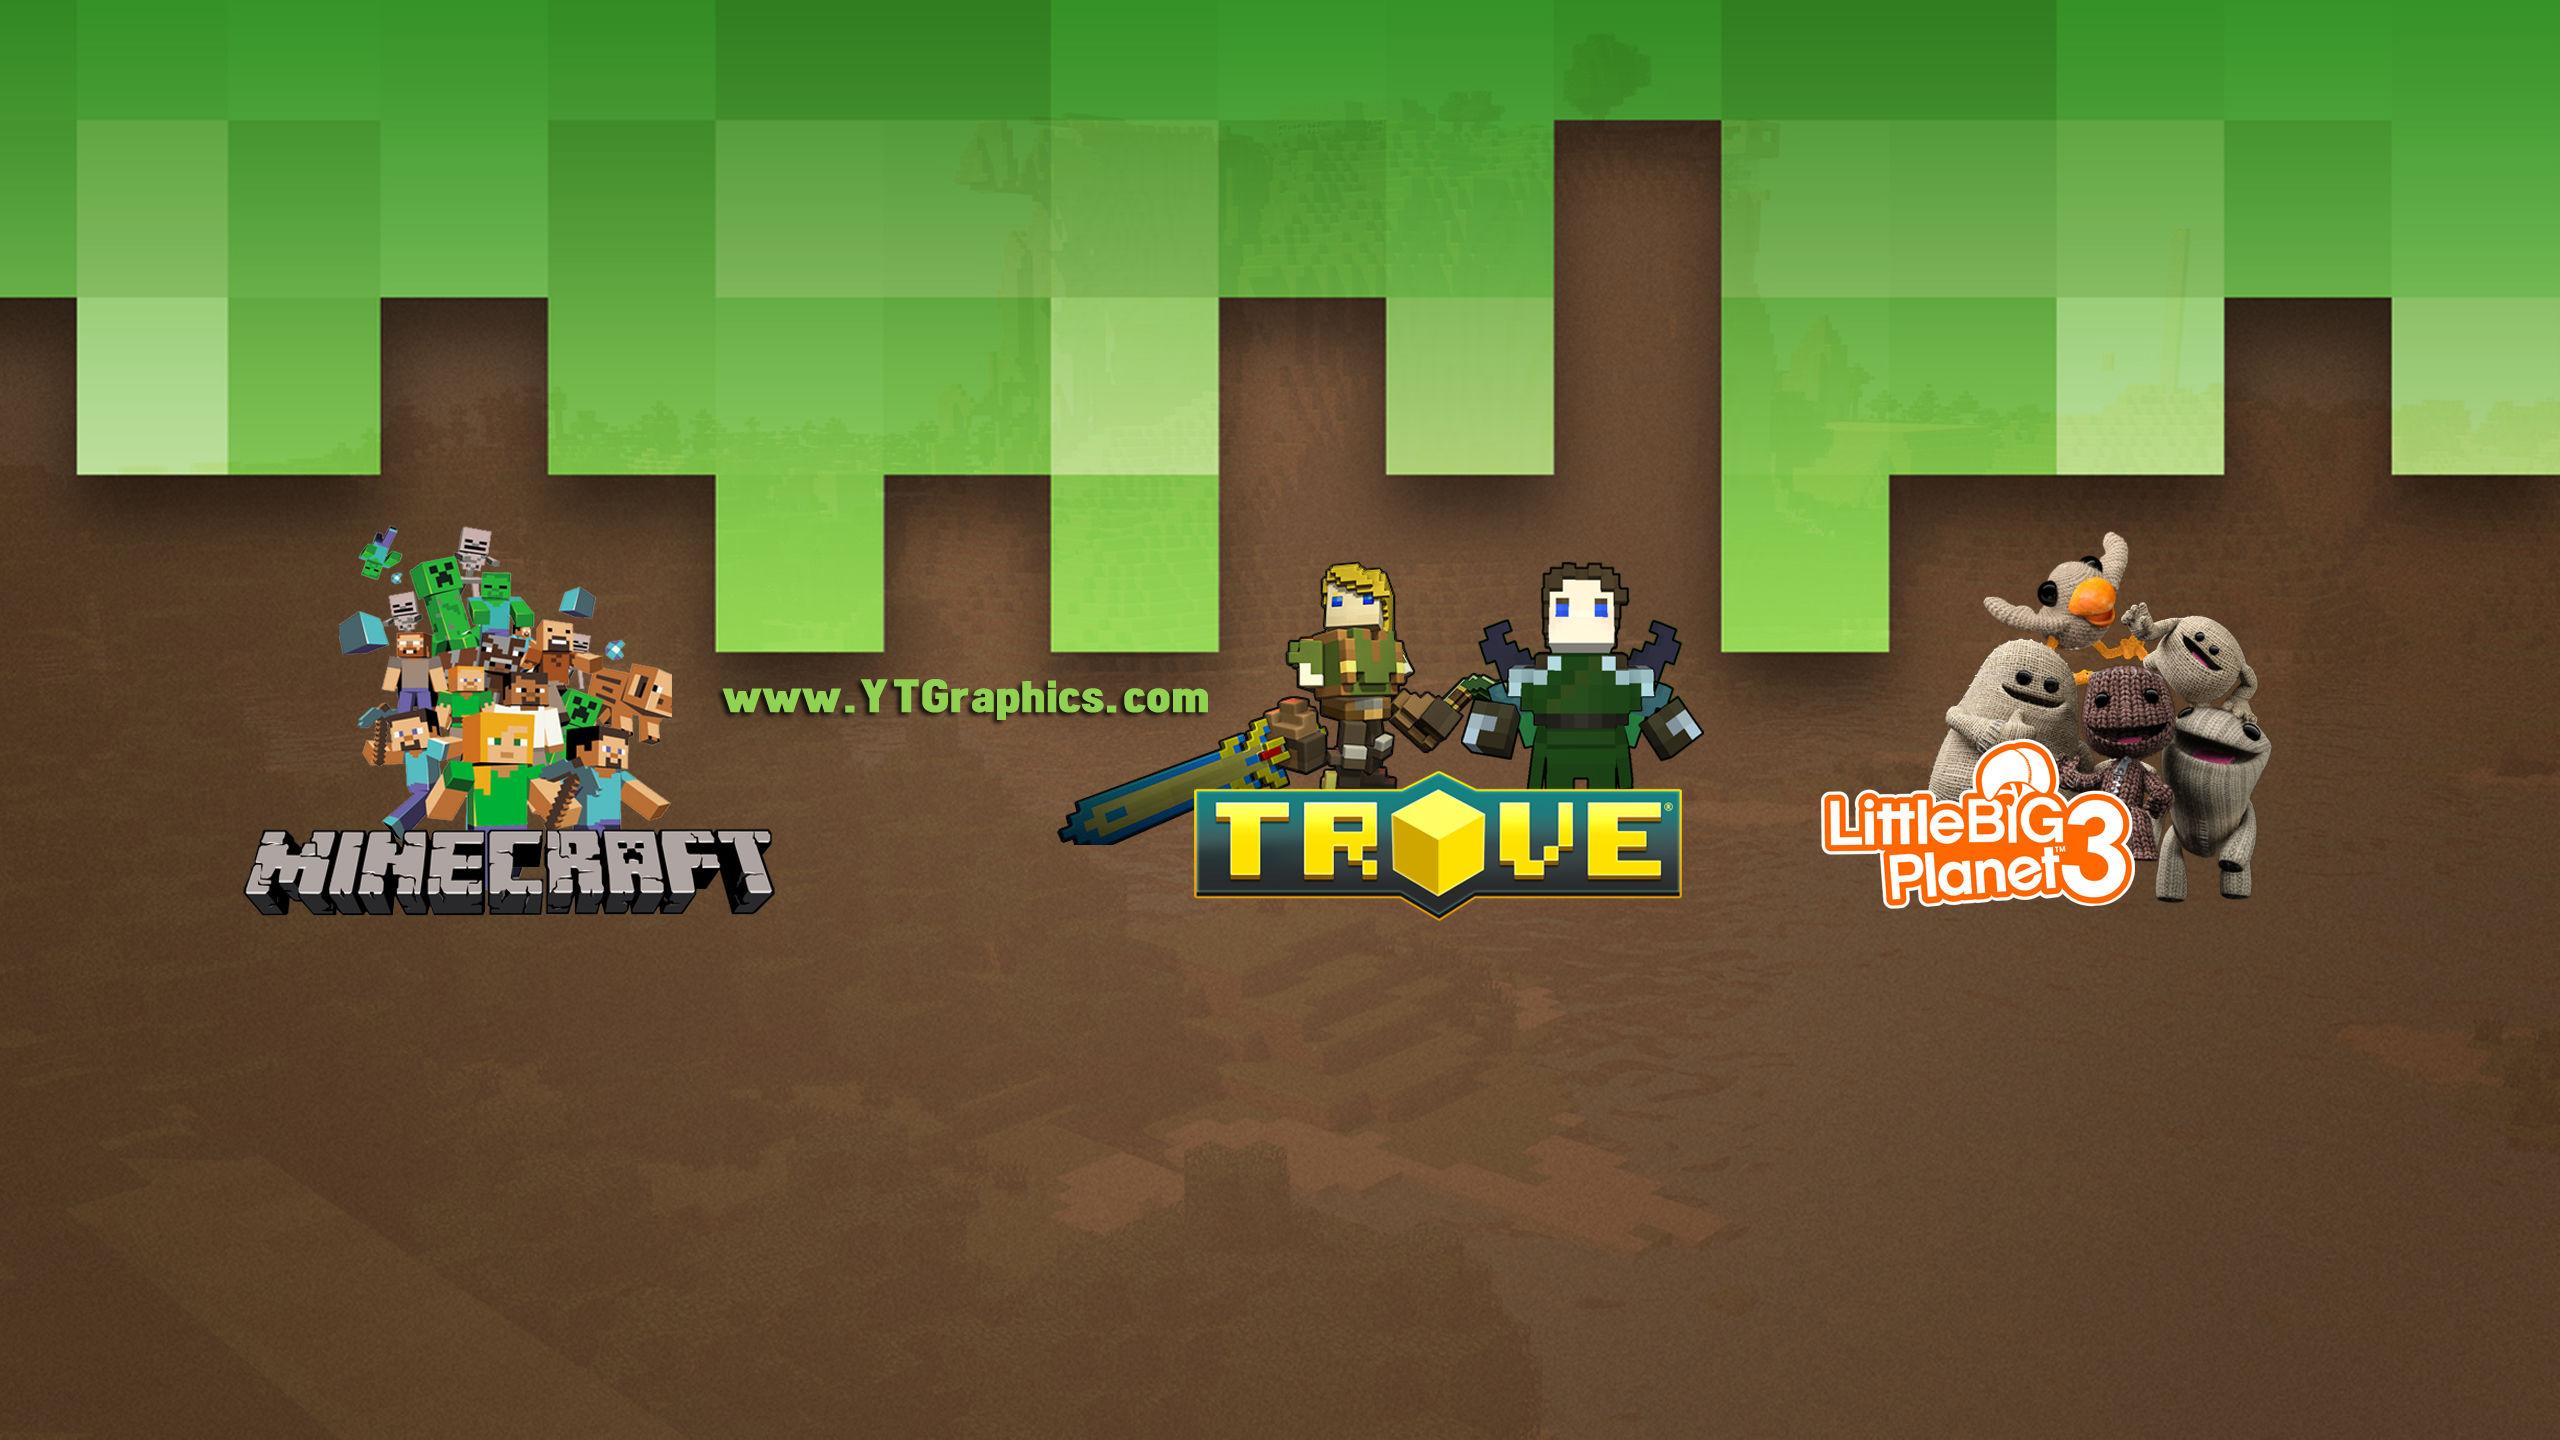 Mix Minecraft Trove Littlebigplanet 3 Youtube Channel Art Banner